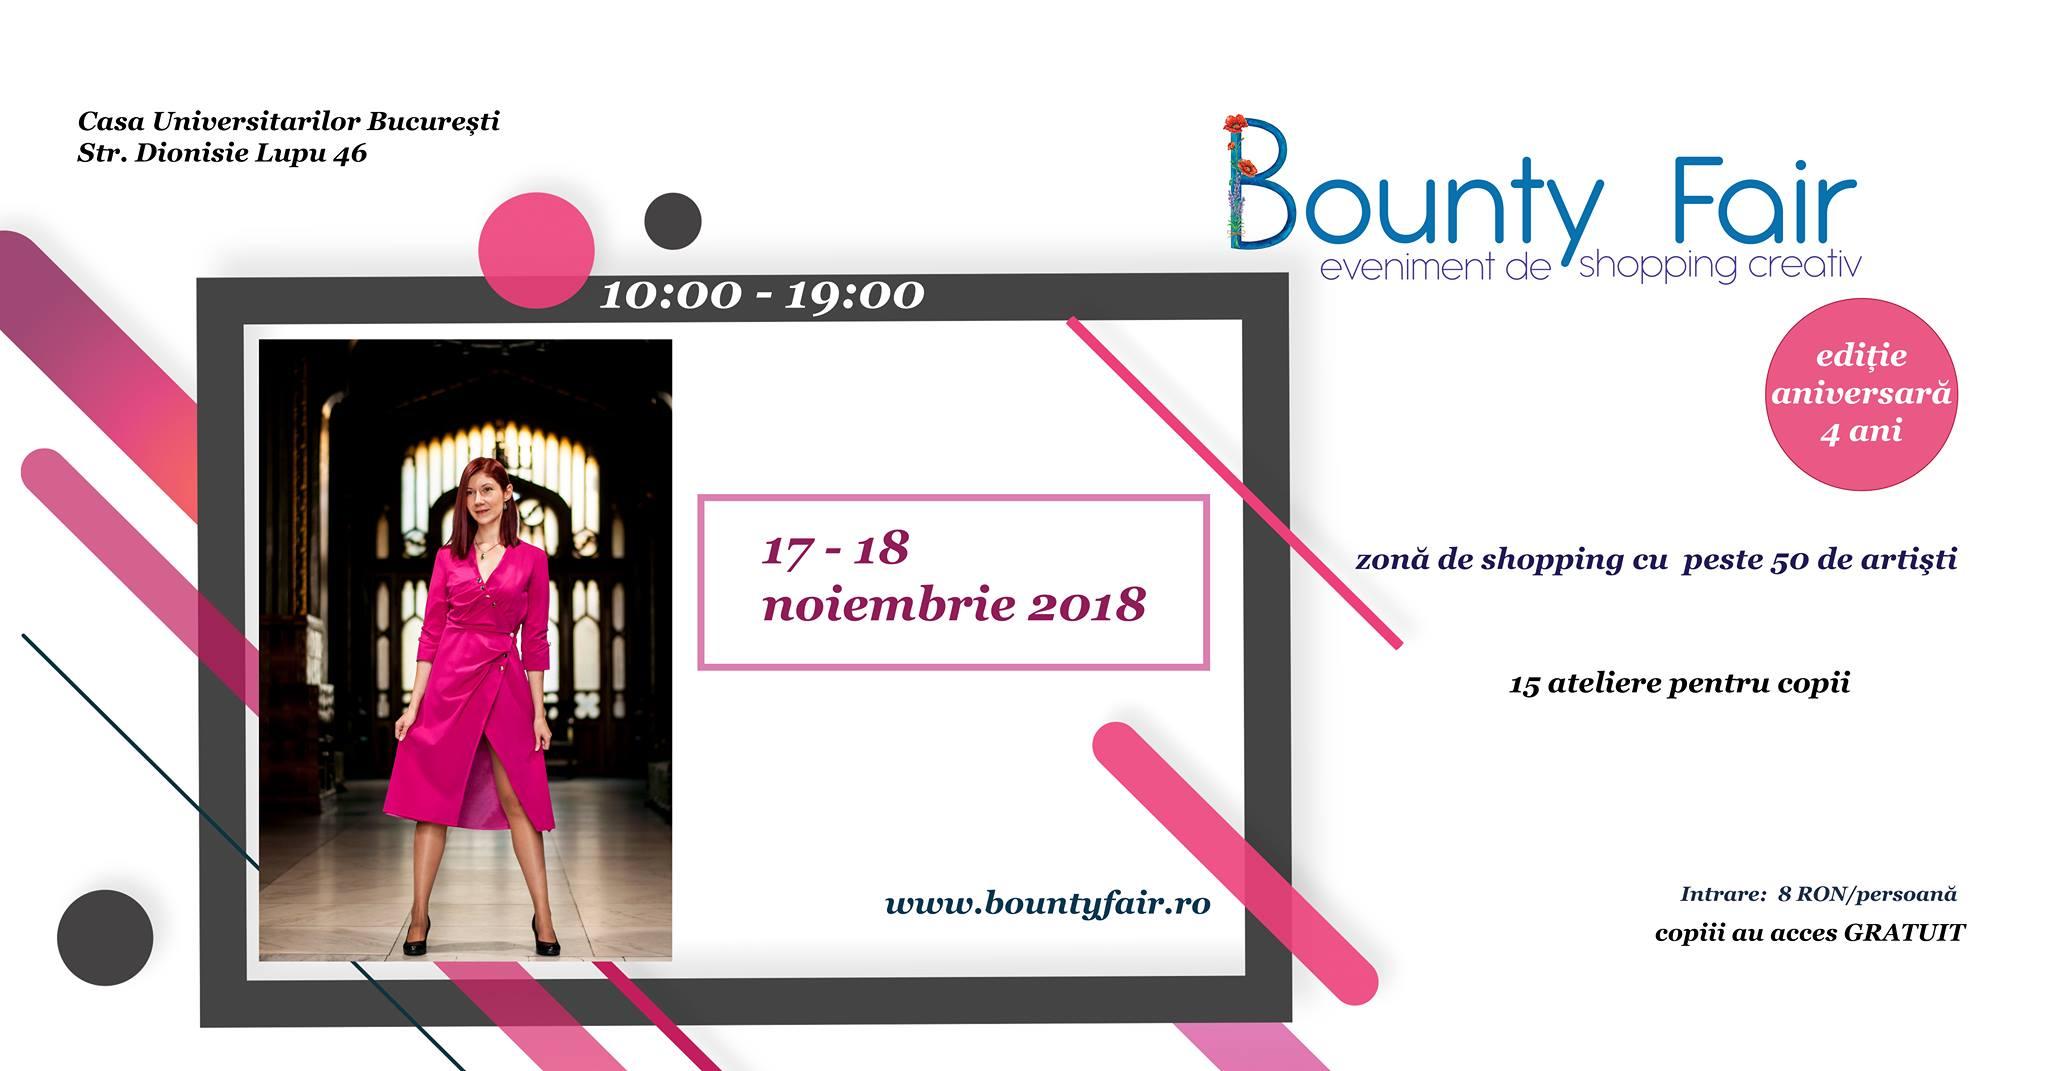 Bounty Fair editie aniversara